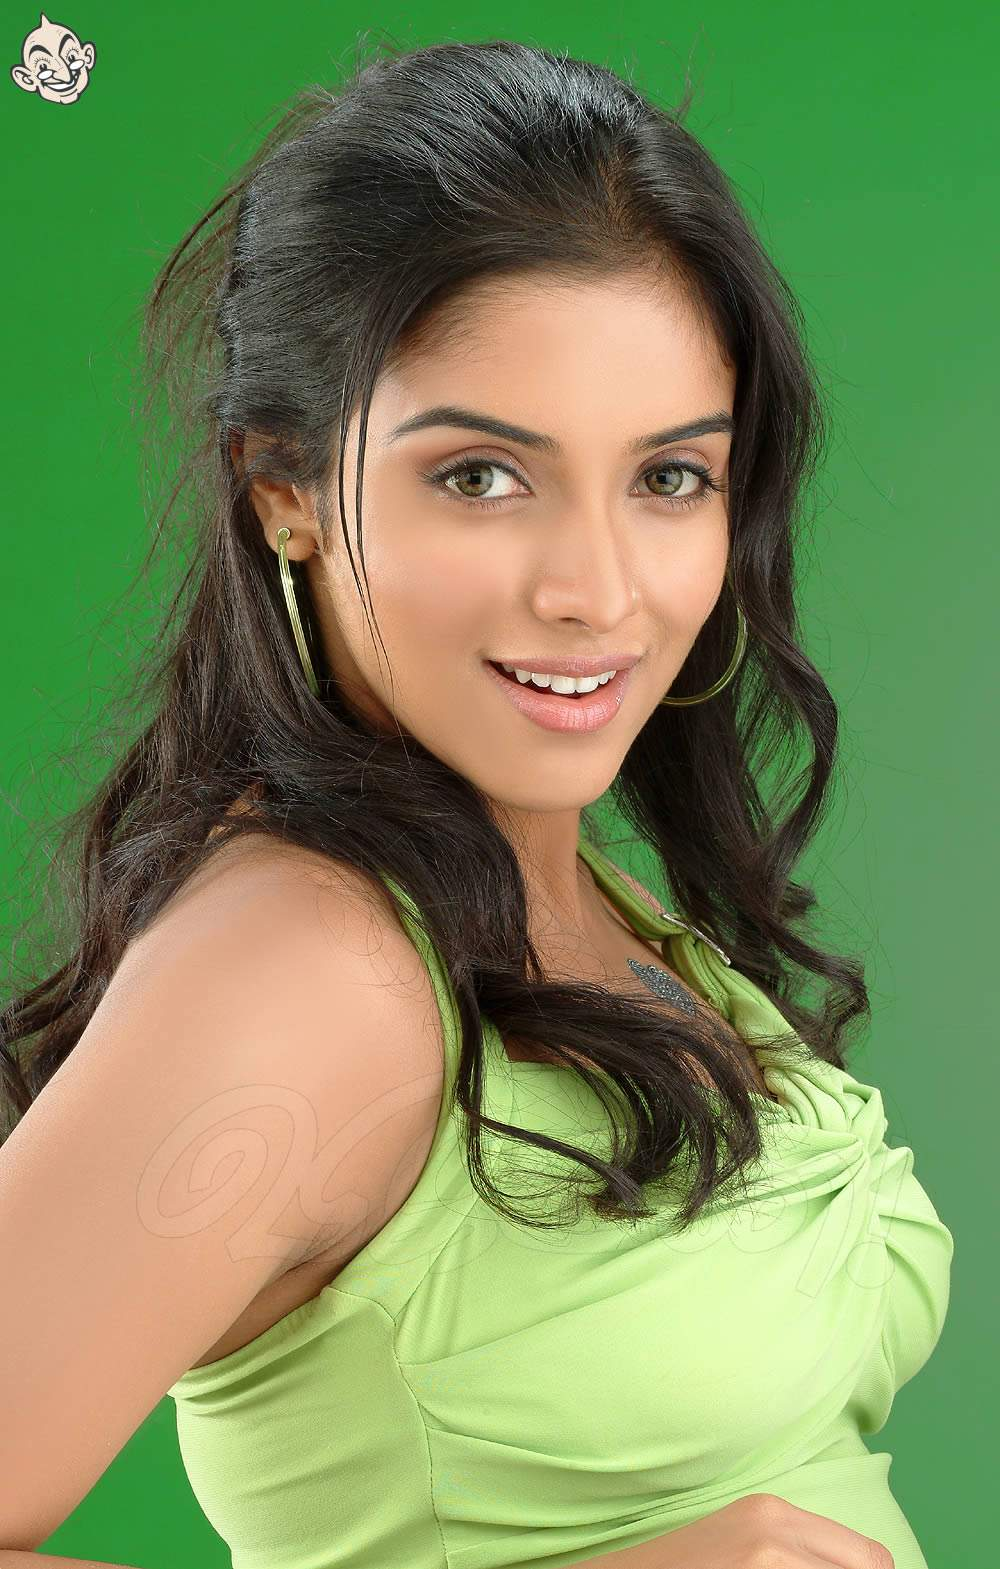 Tamil actress asin profile amazing ideas debut film narendran makan jayakanthan vaka malayalam altavistaventures Gallery